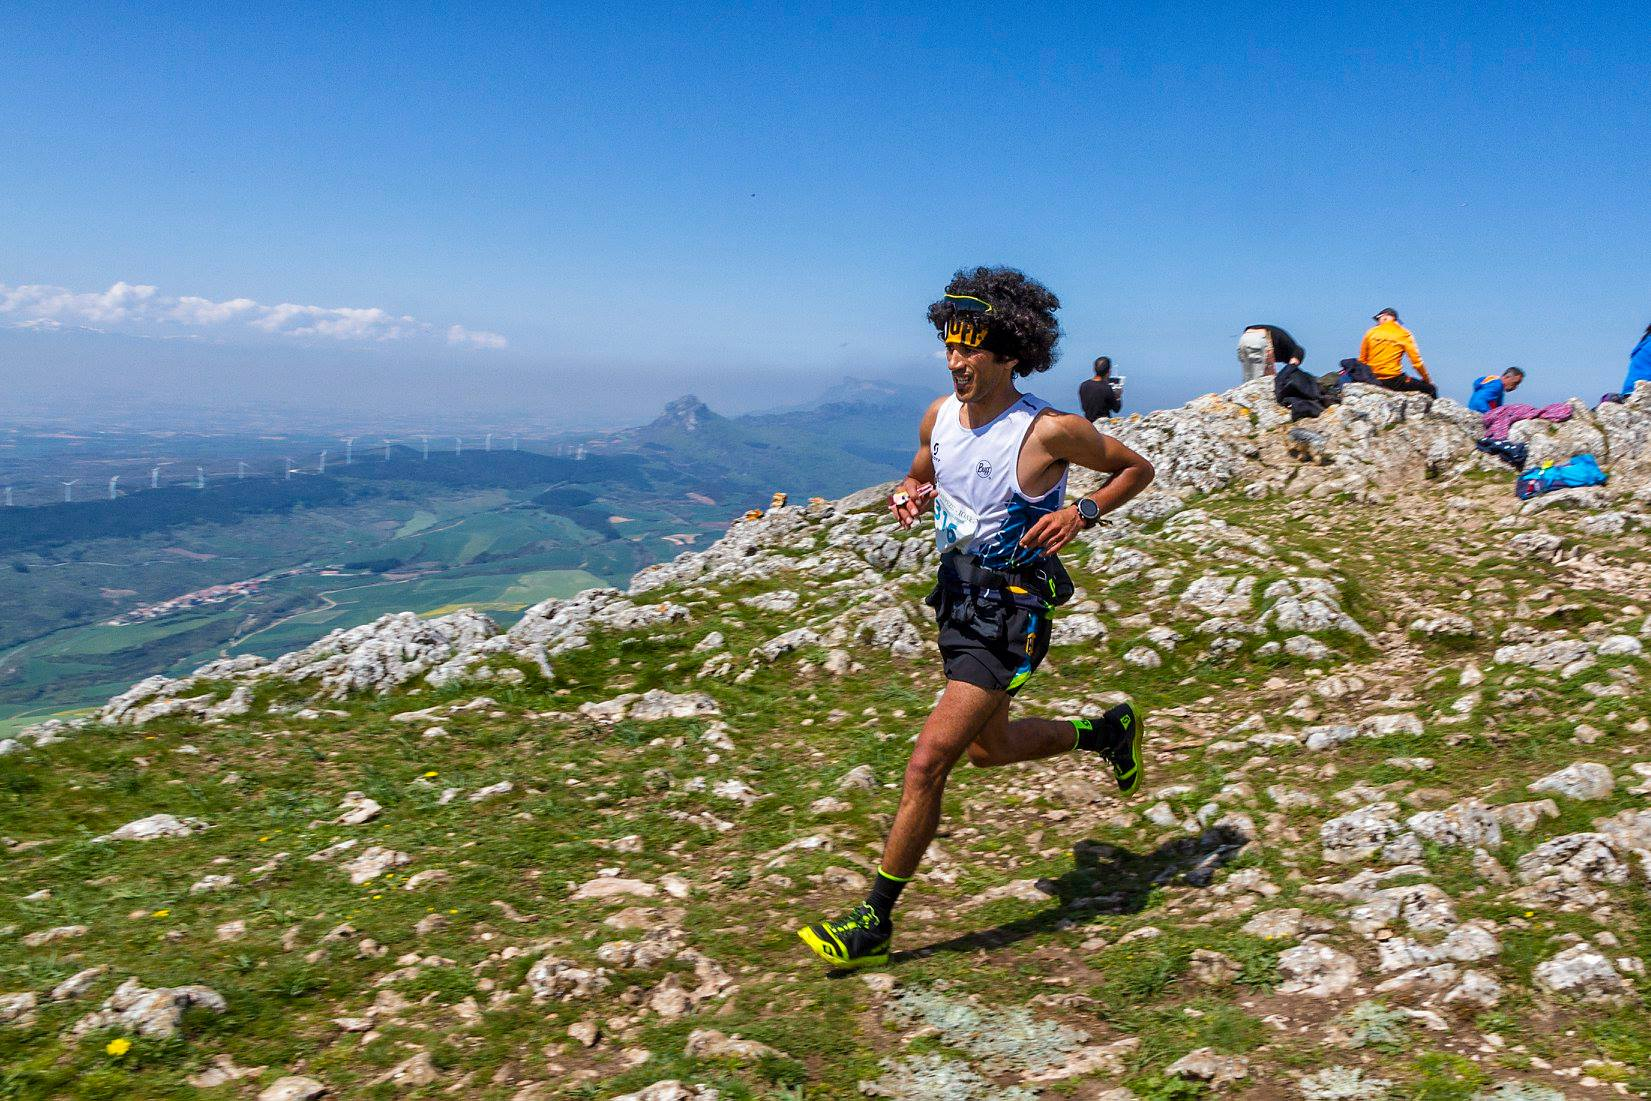 Kanpezu Ioar será el tercer 'asalto' de la Copa de España de Carreras por Montaña en Línea FEDME – Gran Premio Tuga